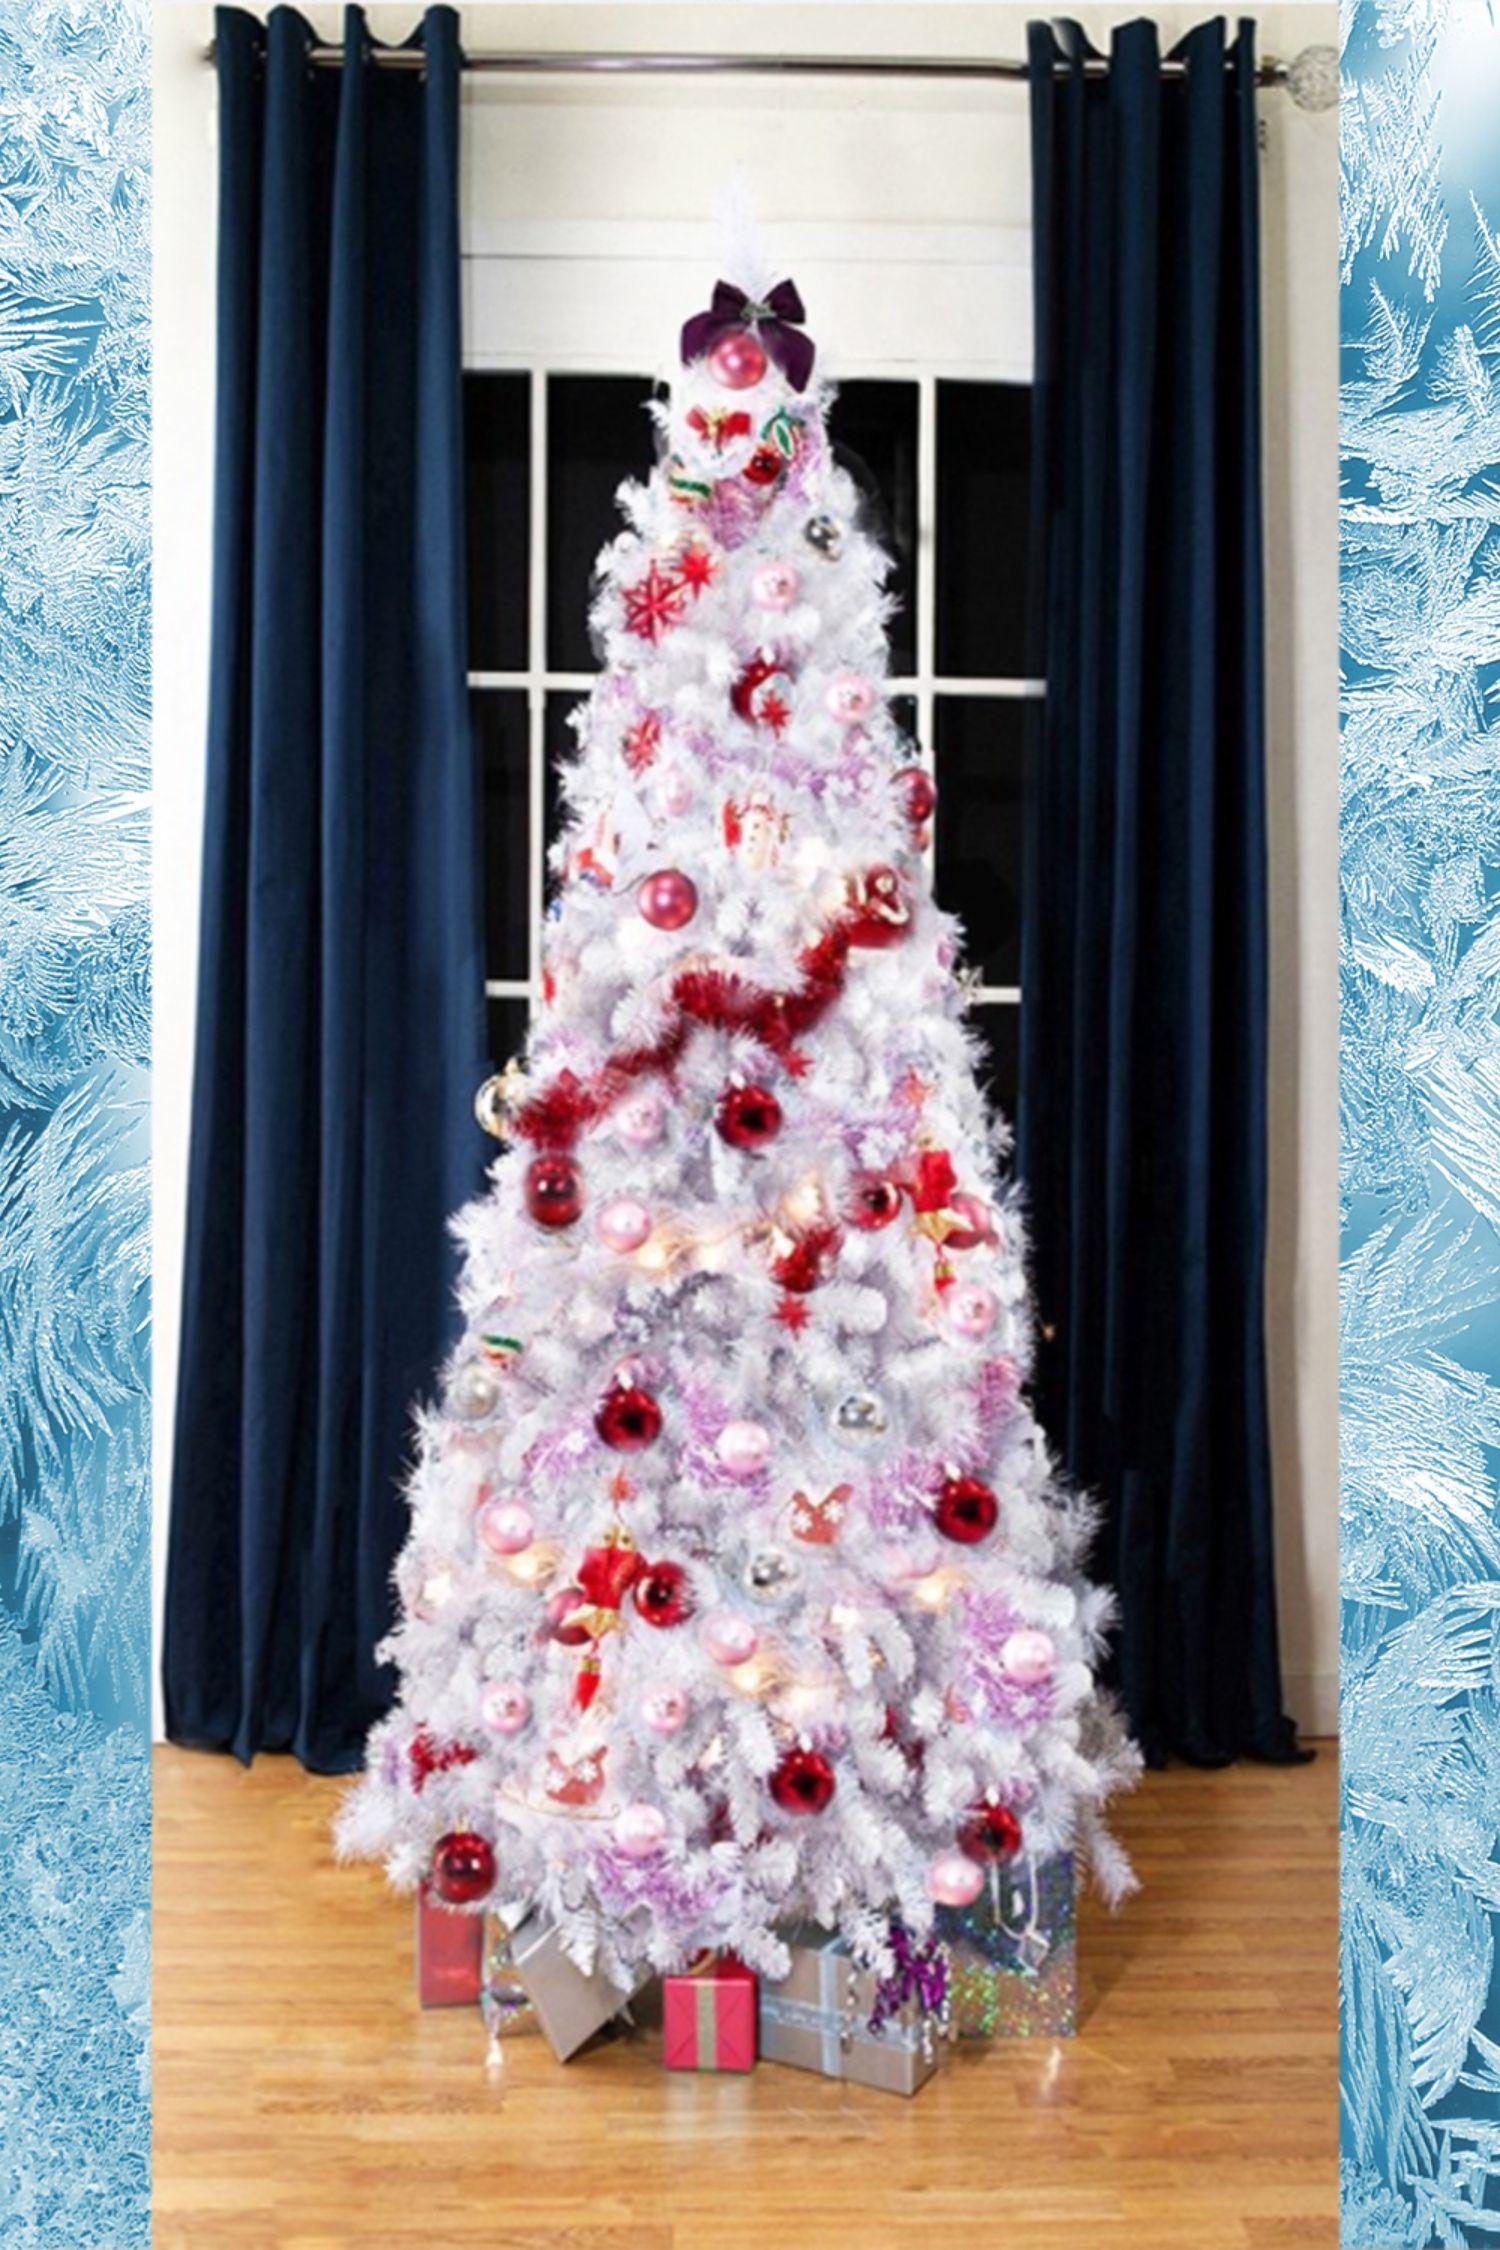 White Bergen Flock Artificial Christmas tree. 7ft tall